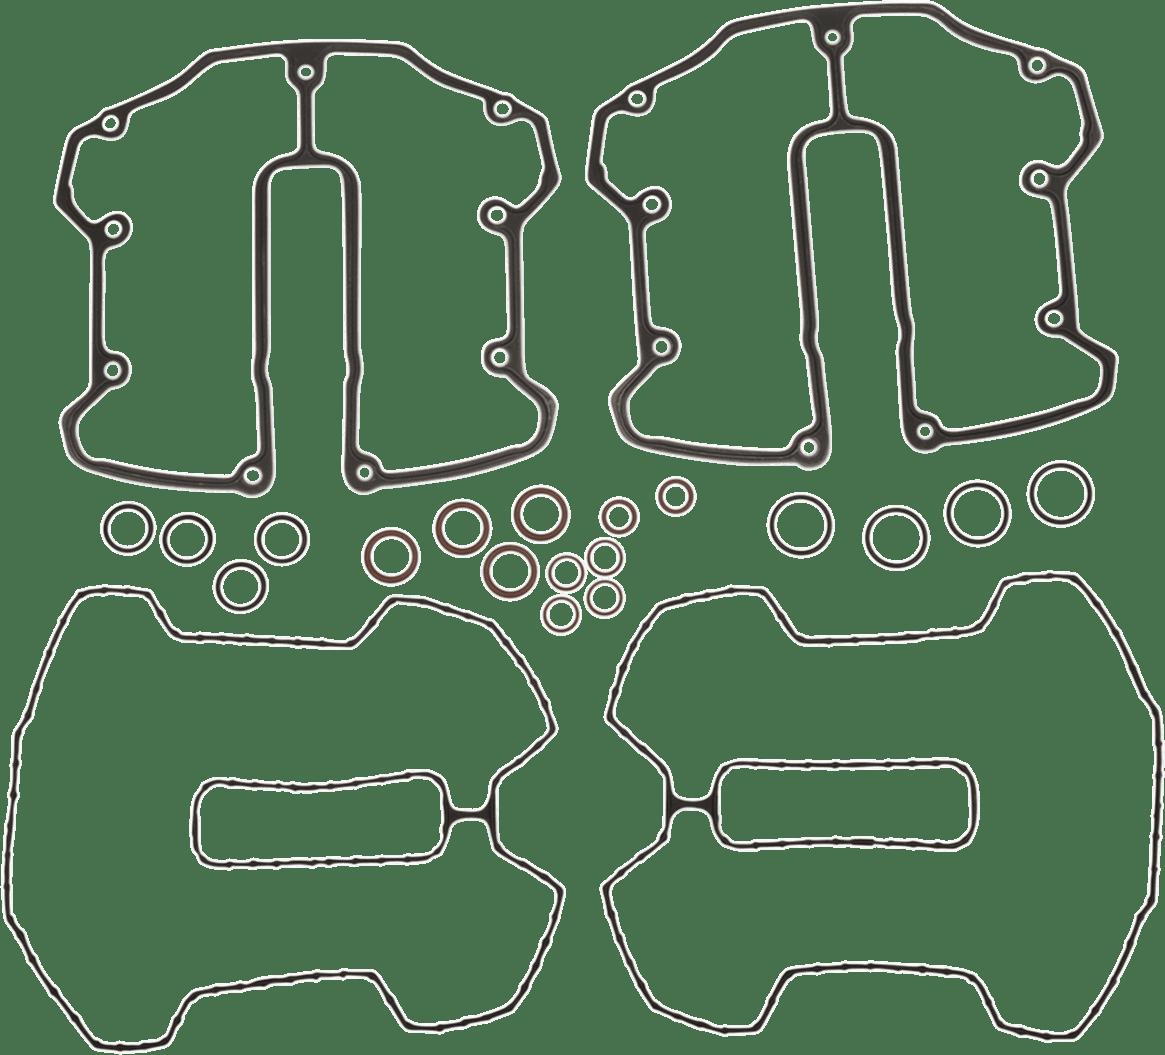 Cometic Rocker Box Gasket Kit For 17 19 Harley M8 Dyna